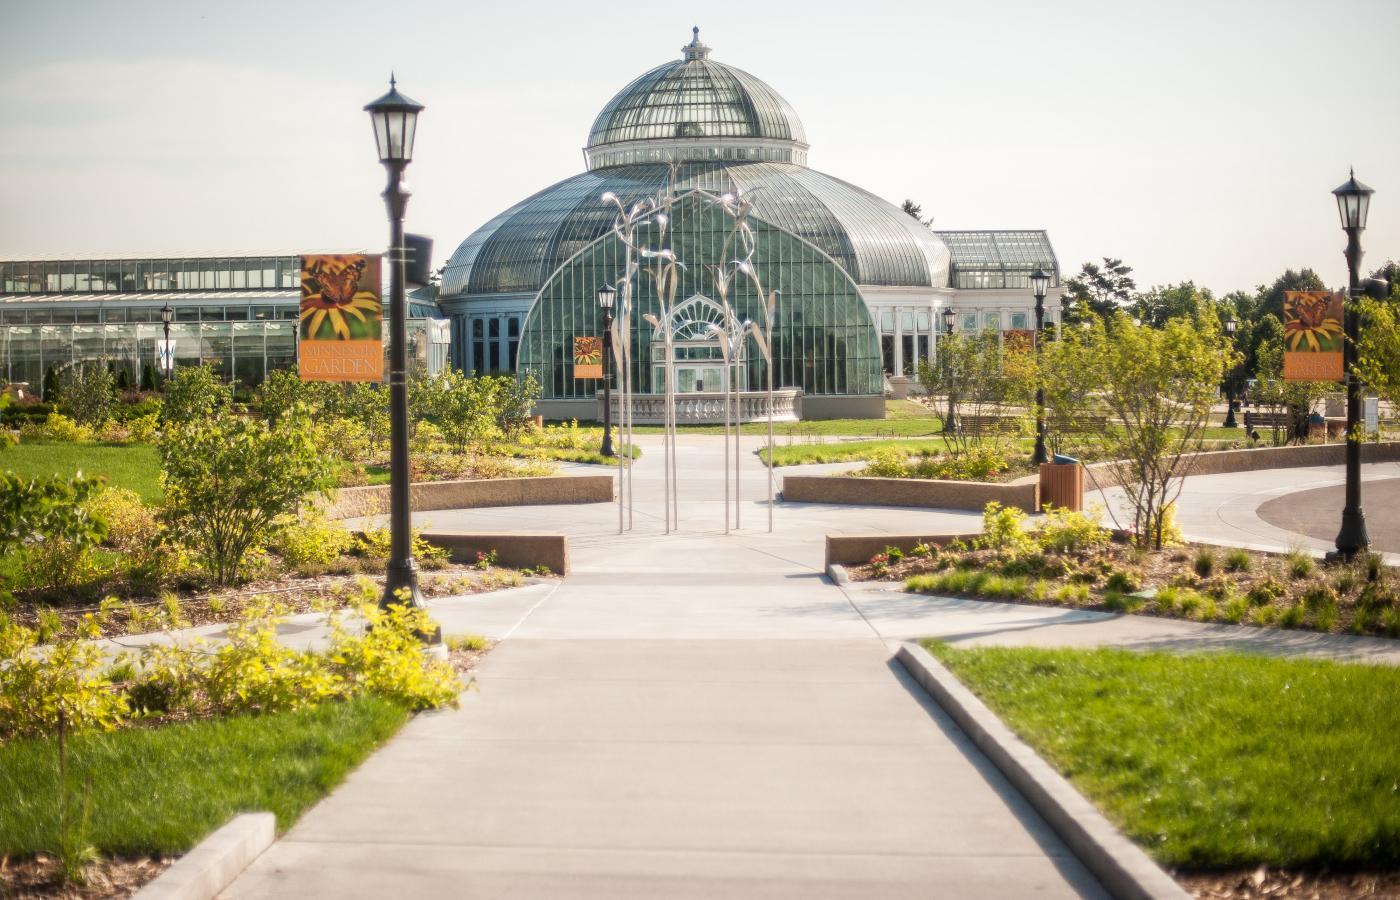 Minnesota Garden at Como Park - 3